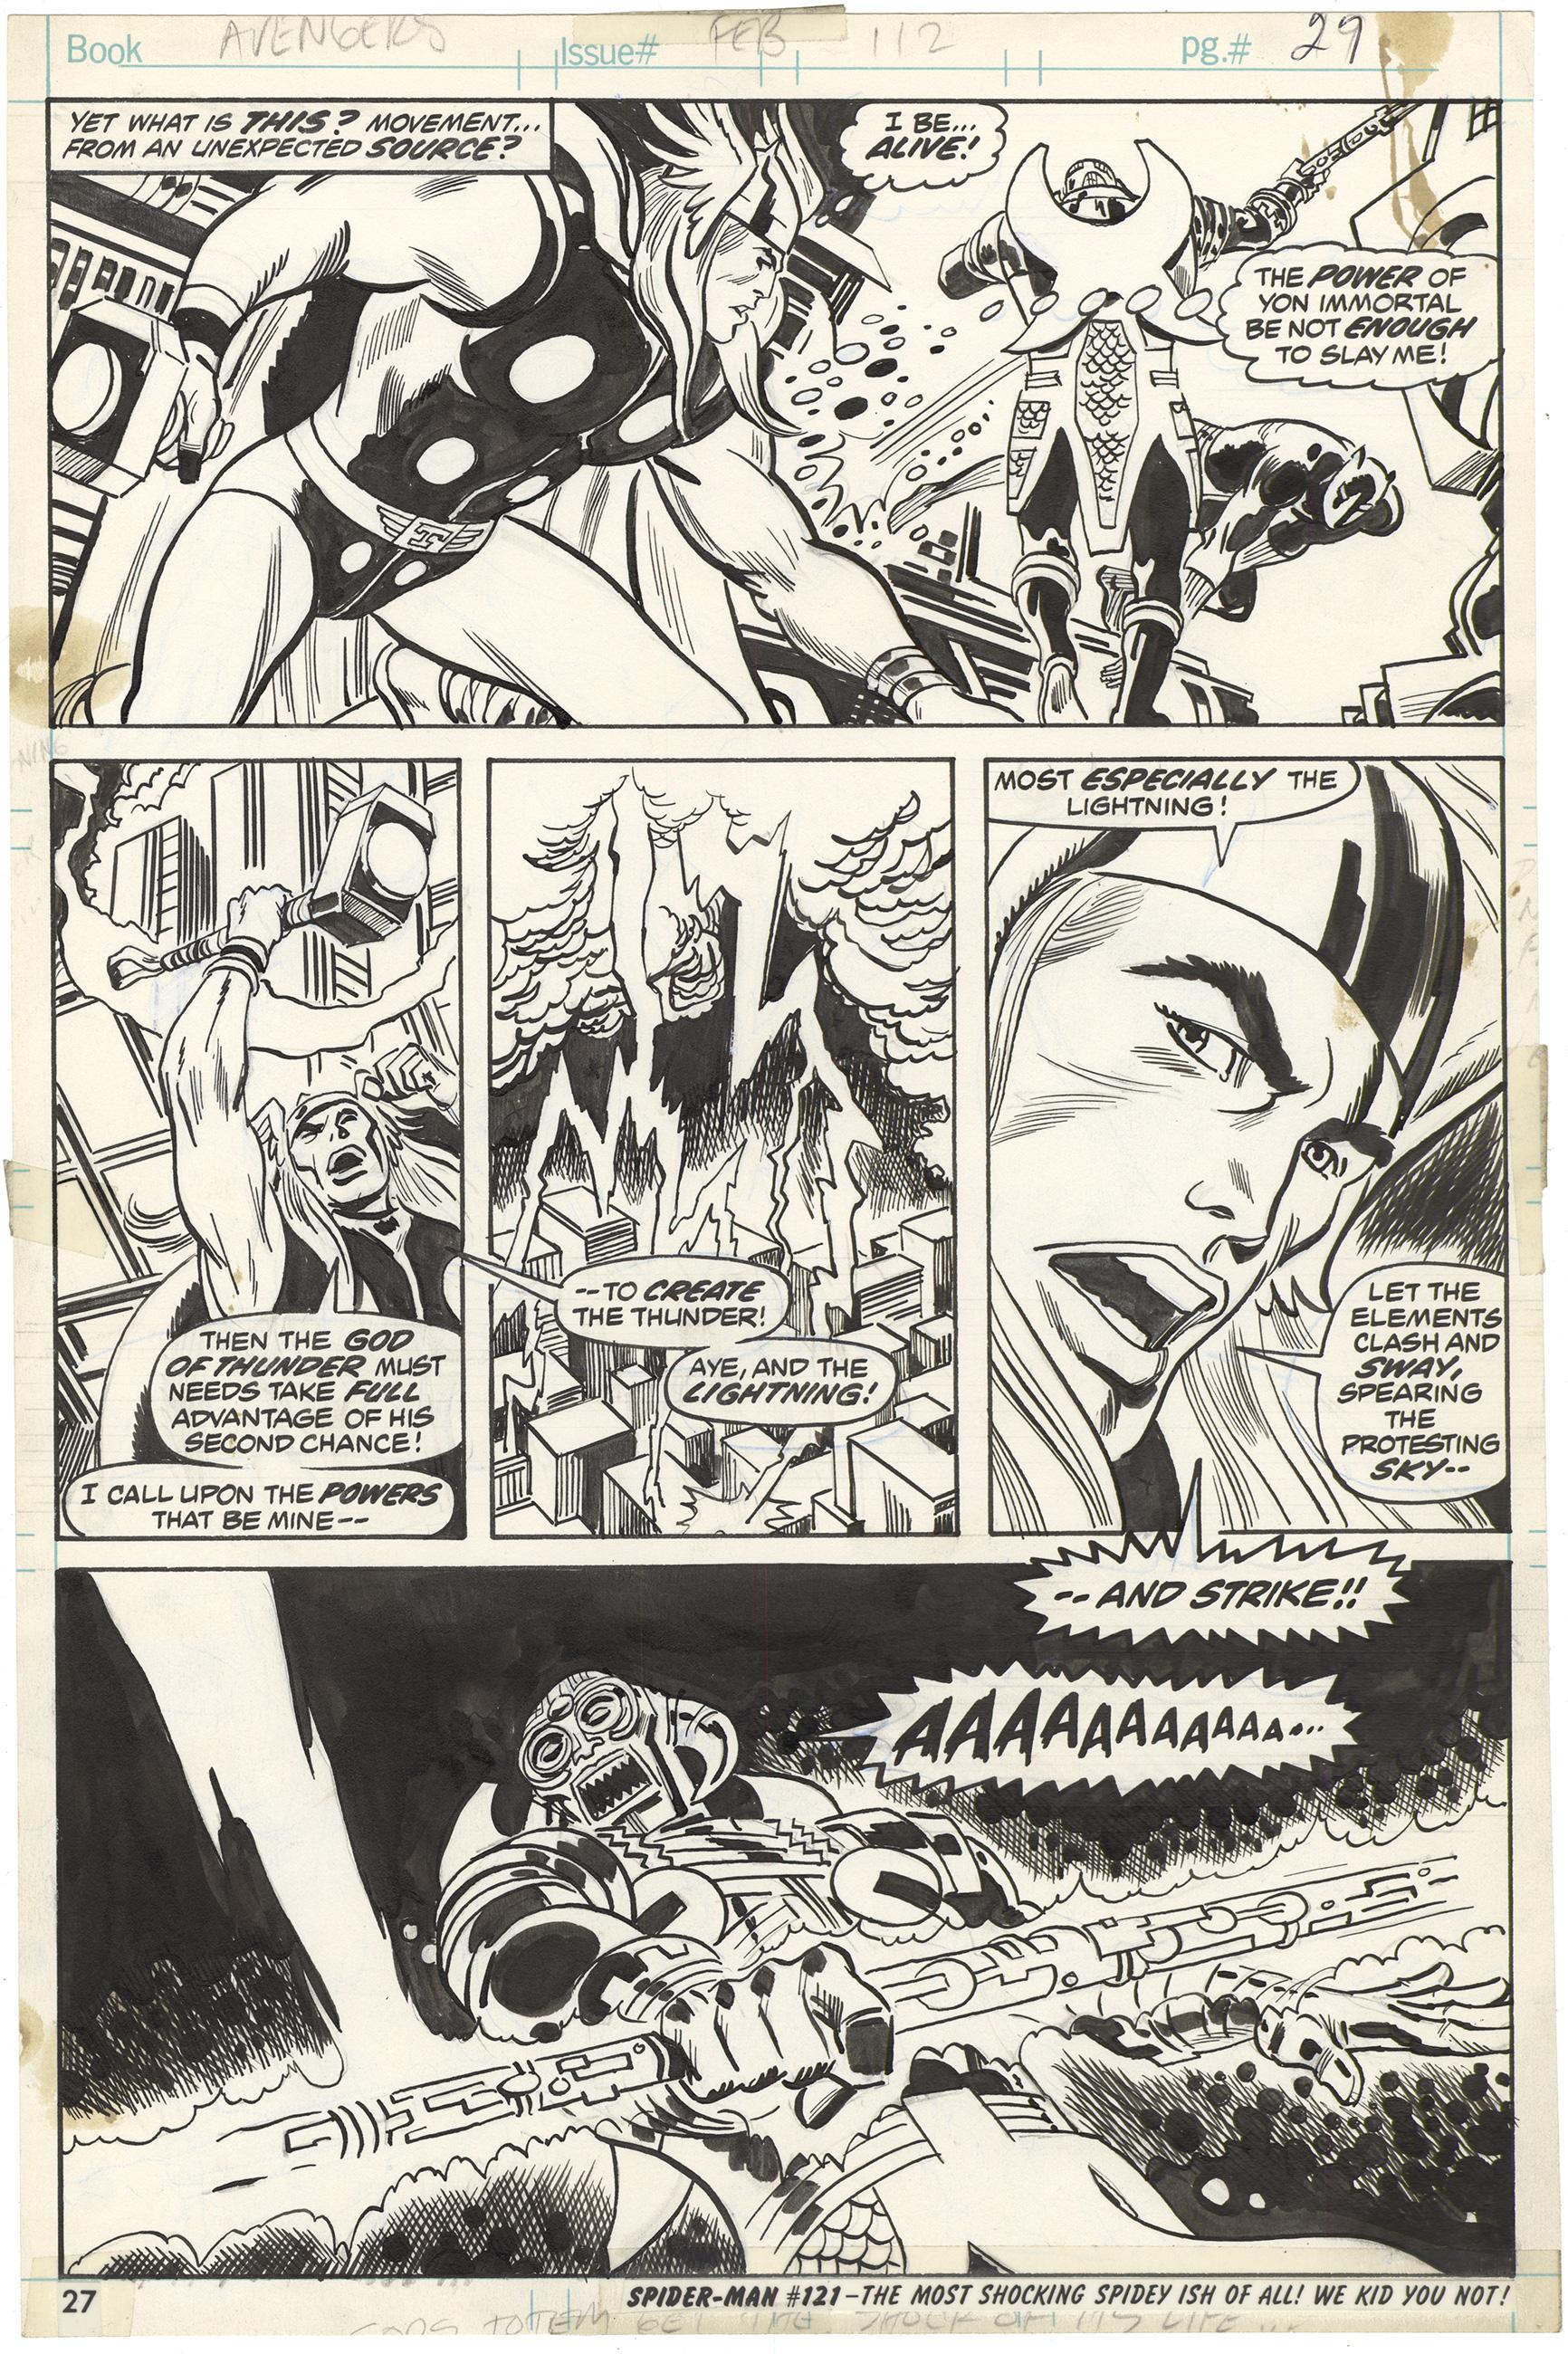 Avengers #112 p27